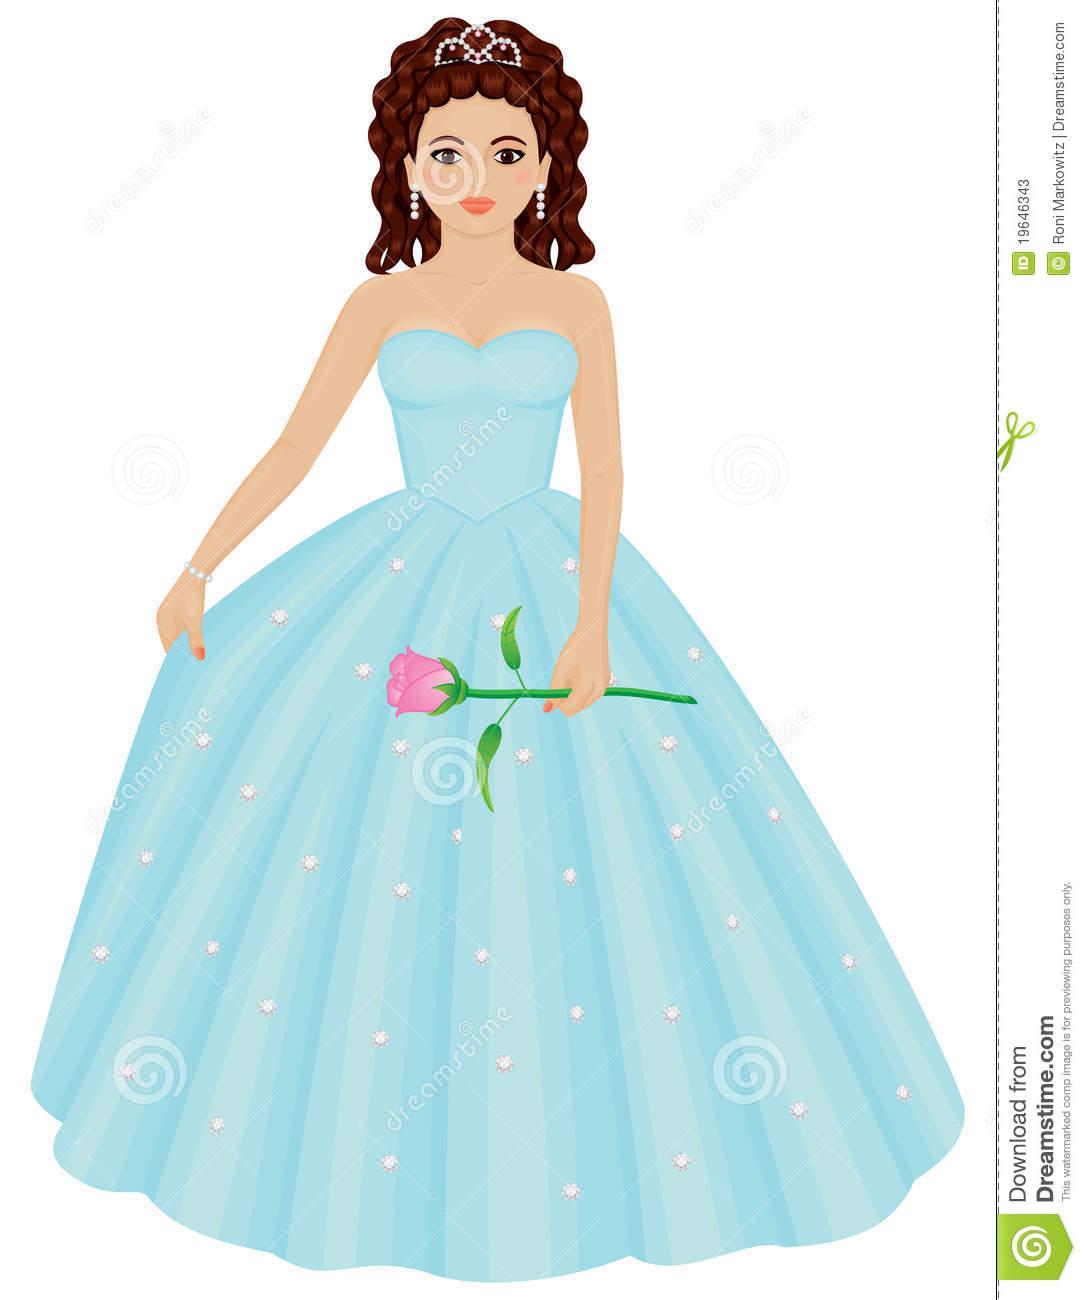 Beauty Queen Clipart.